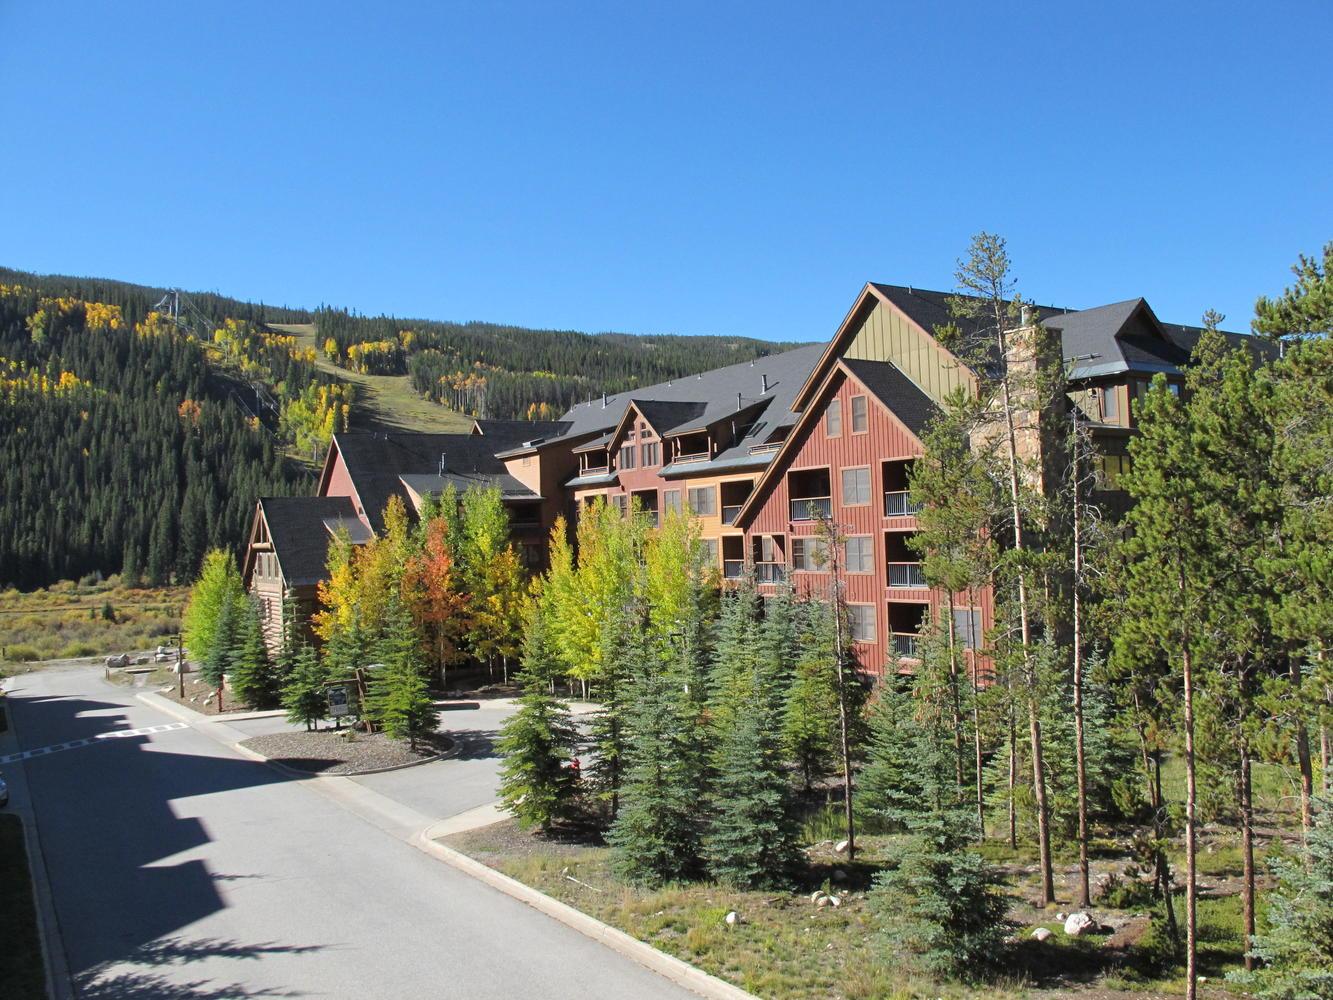 Lodging keystone colorado seymour lodging for Cabins in keystone colorado